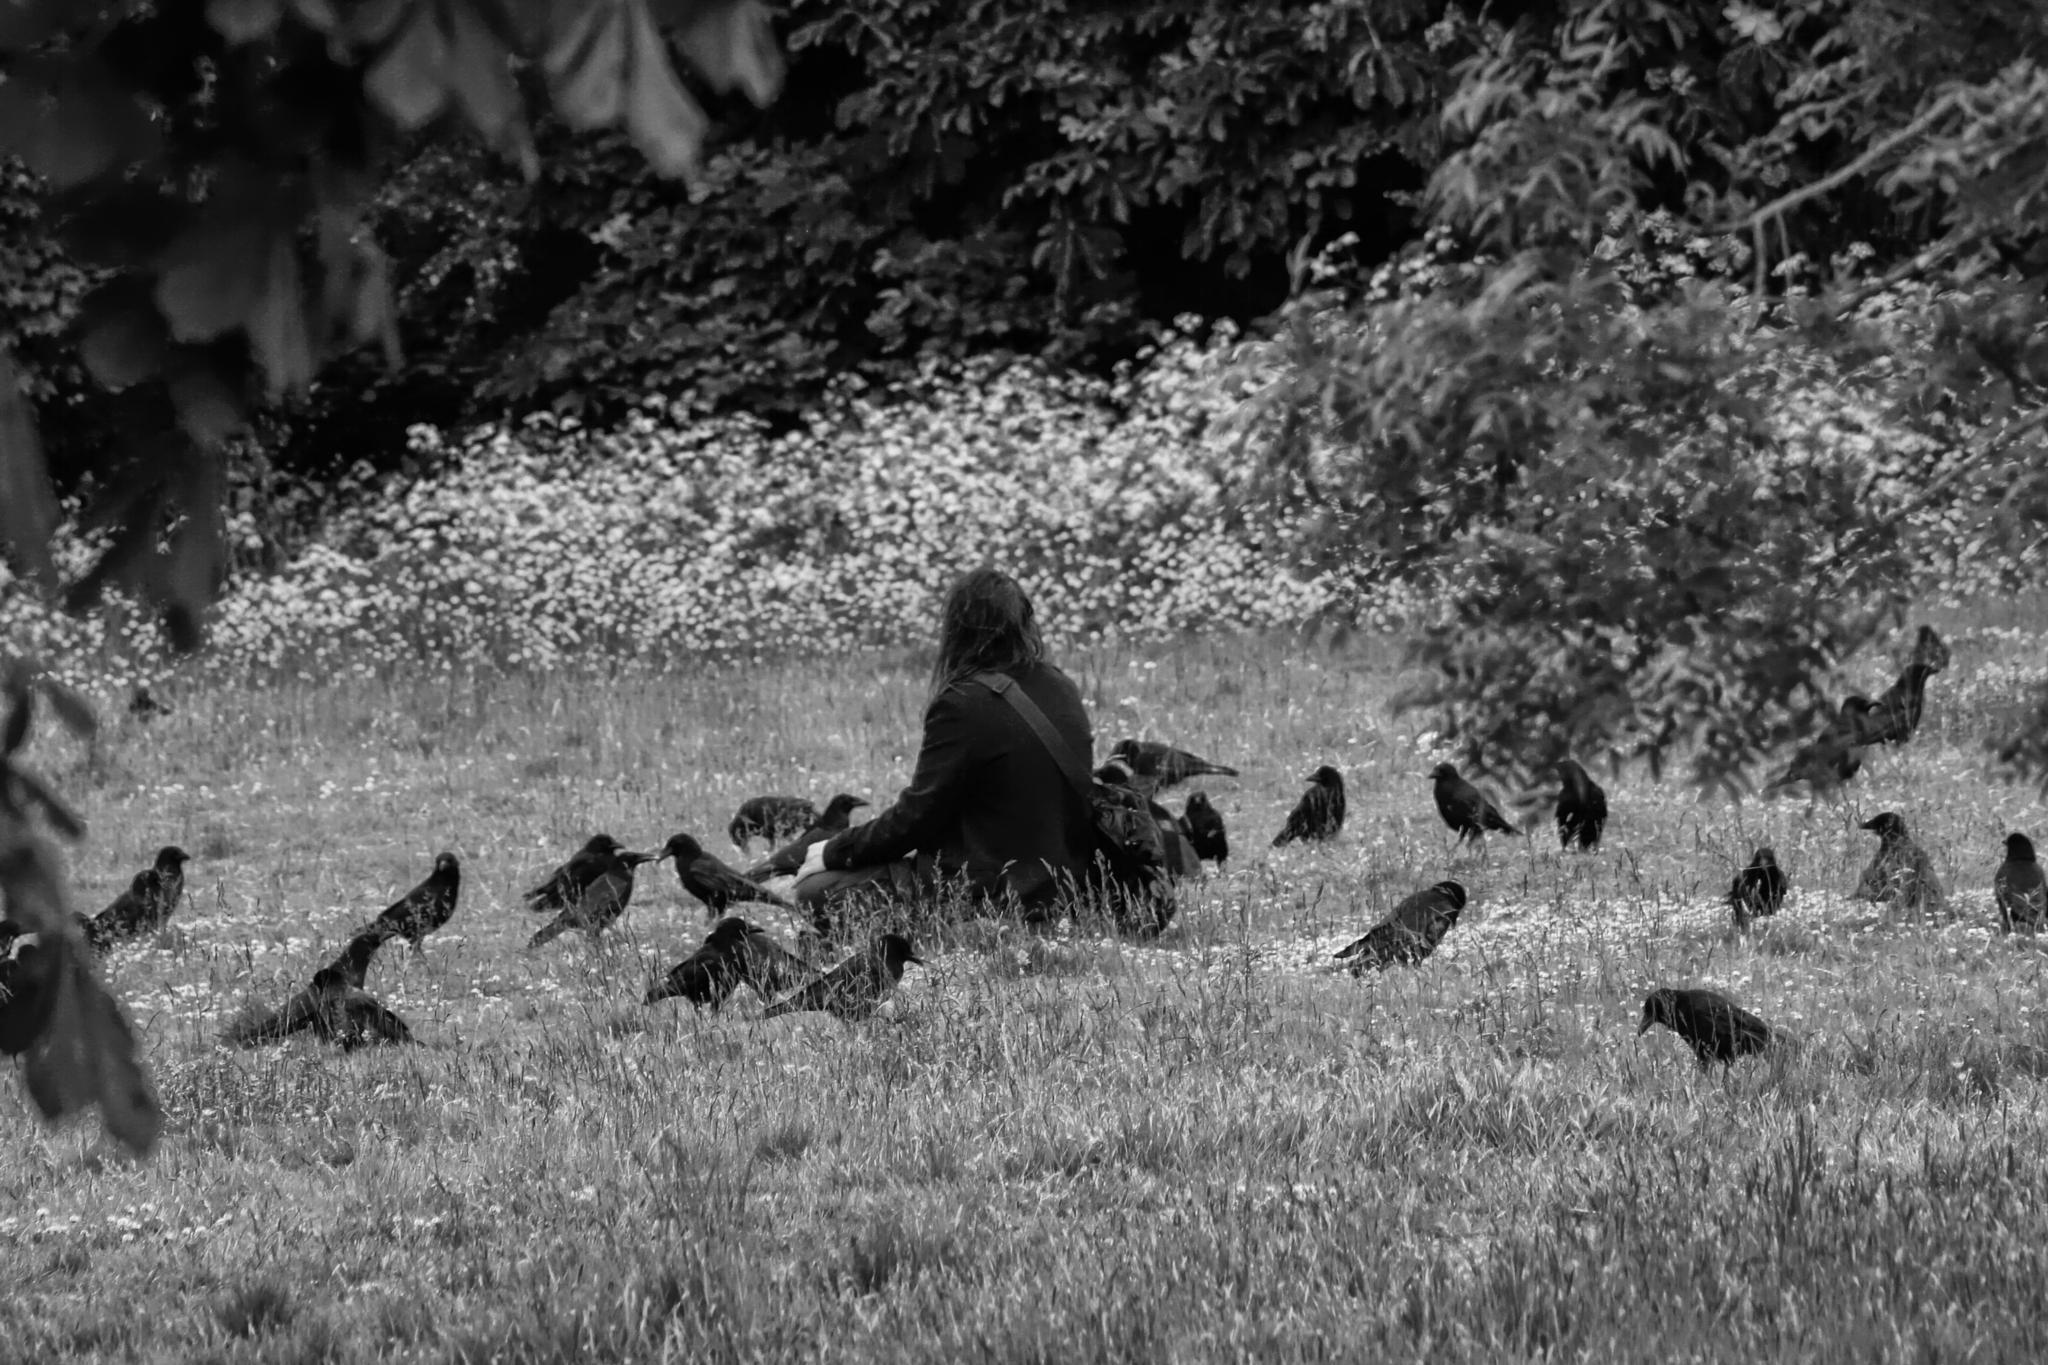 Crow Whisperer by Mark Winstanley